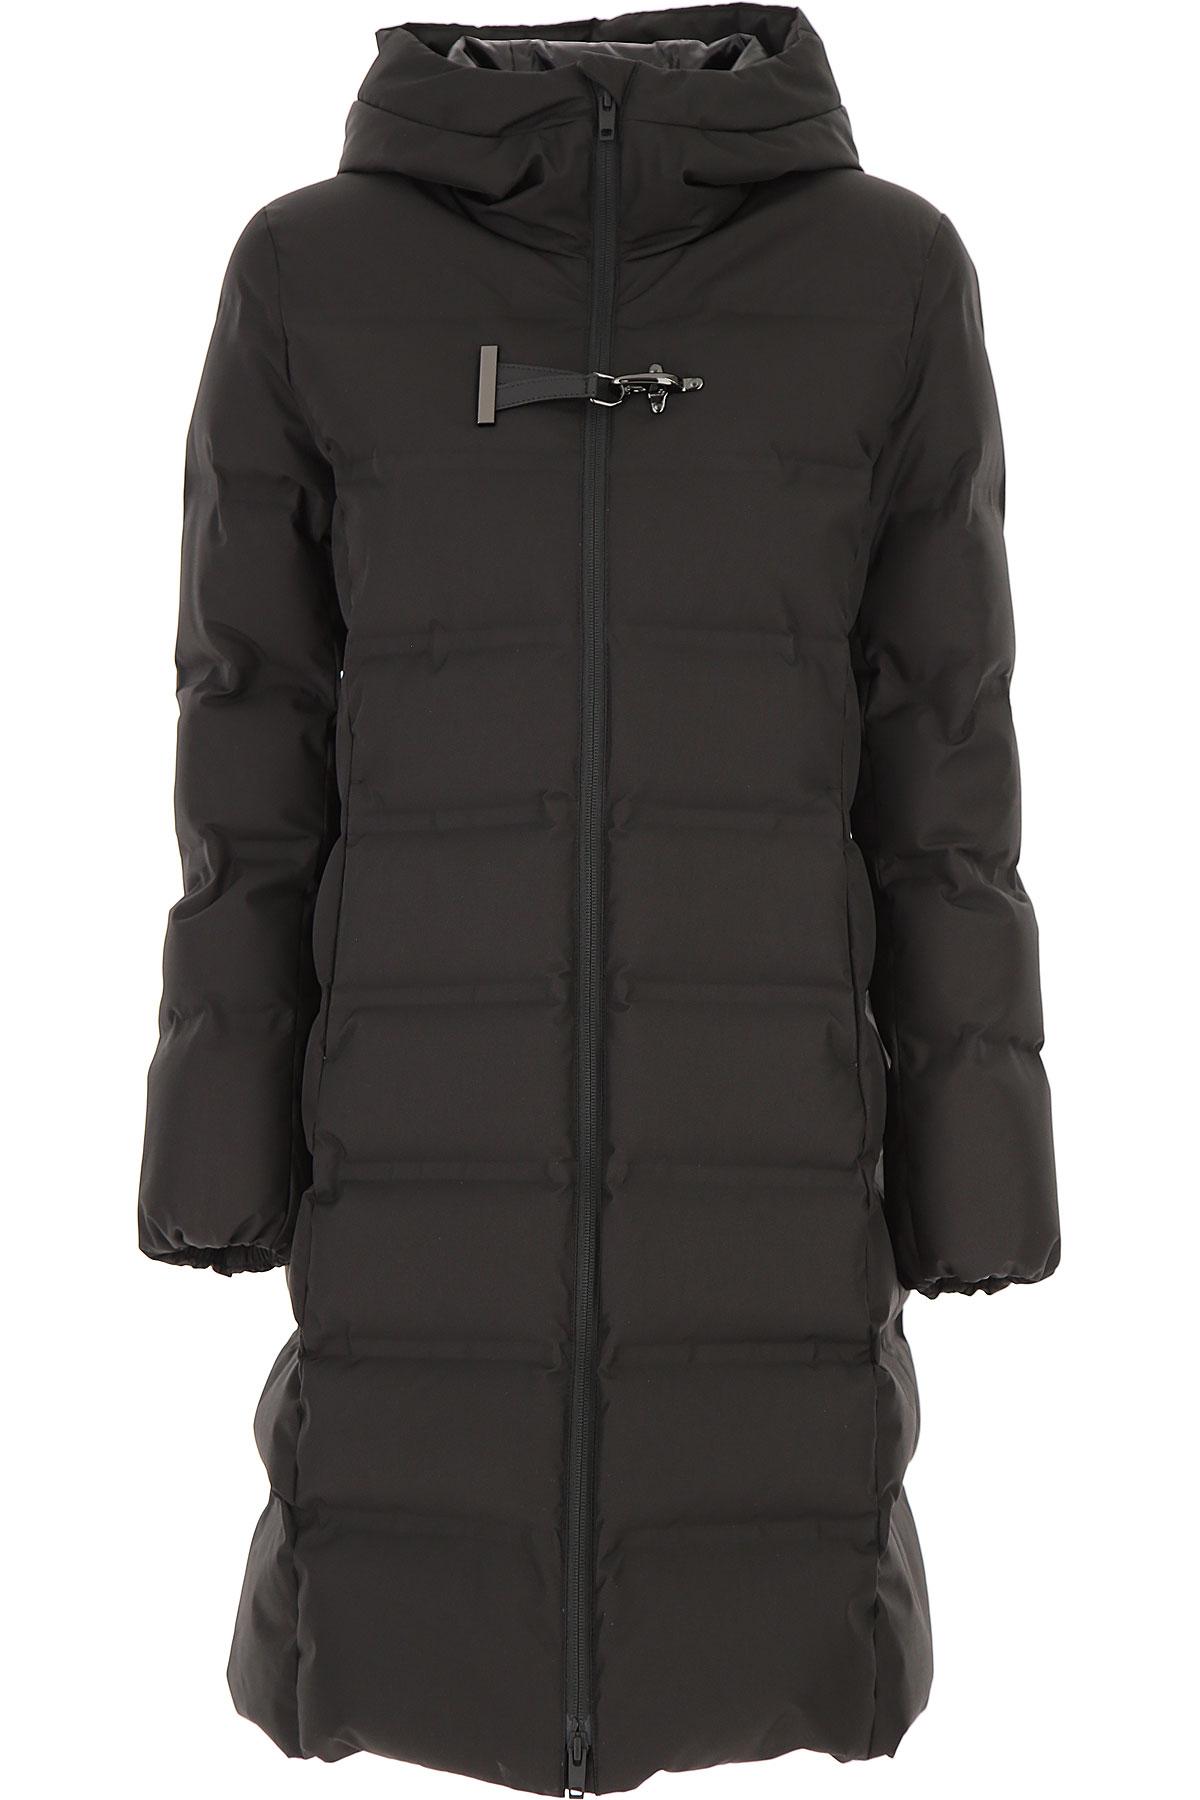 Fay Down Jacket for Women, Puffer Ski Jacket On Sale, Black, Down, 2019, 10 2 4 6 8